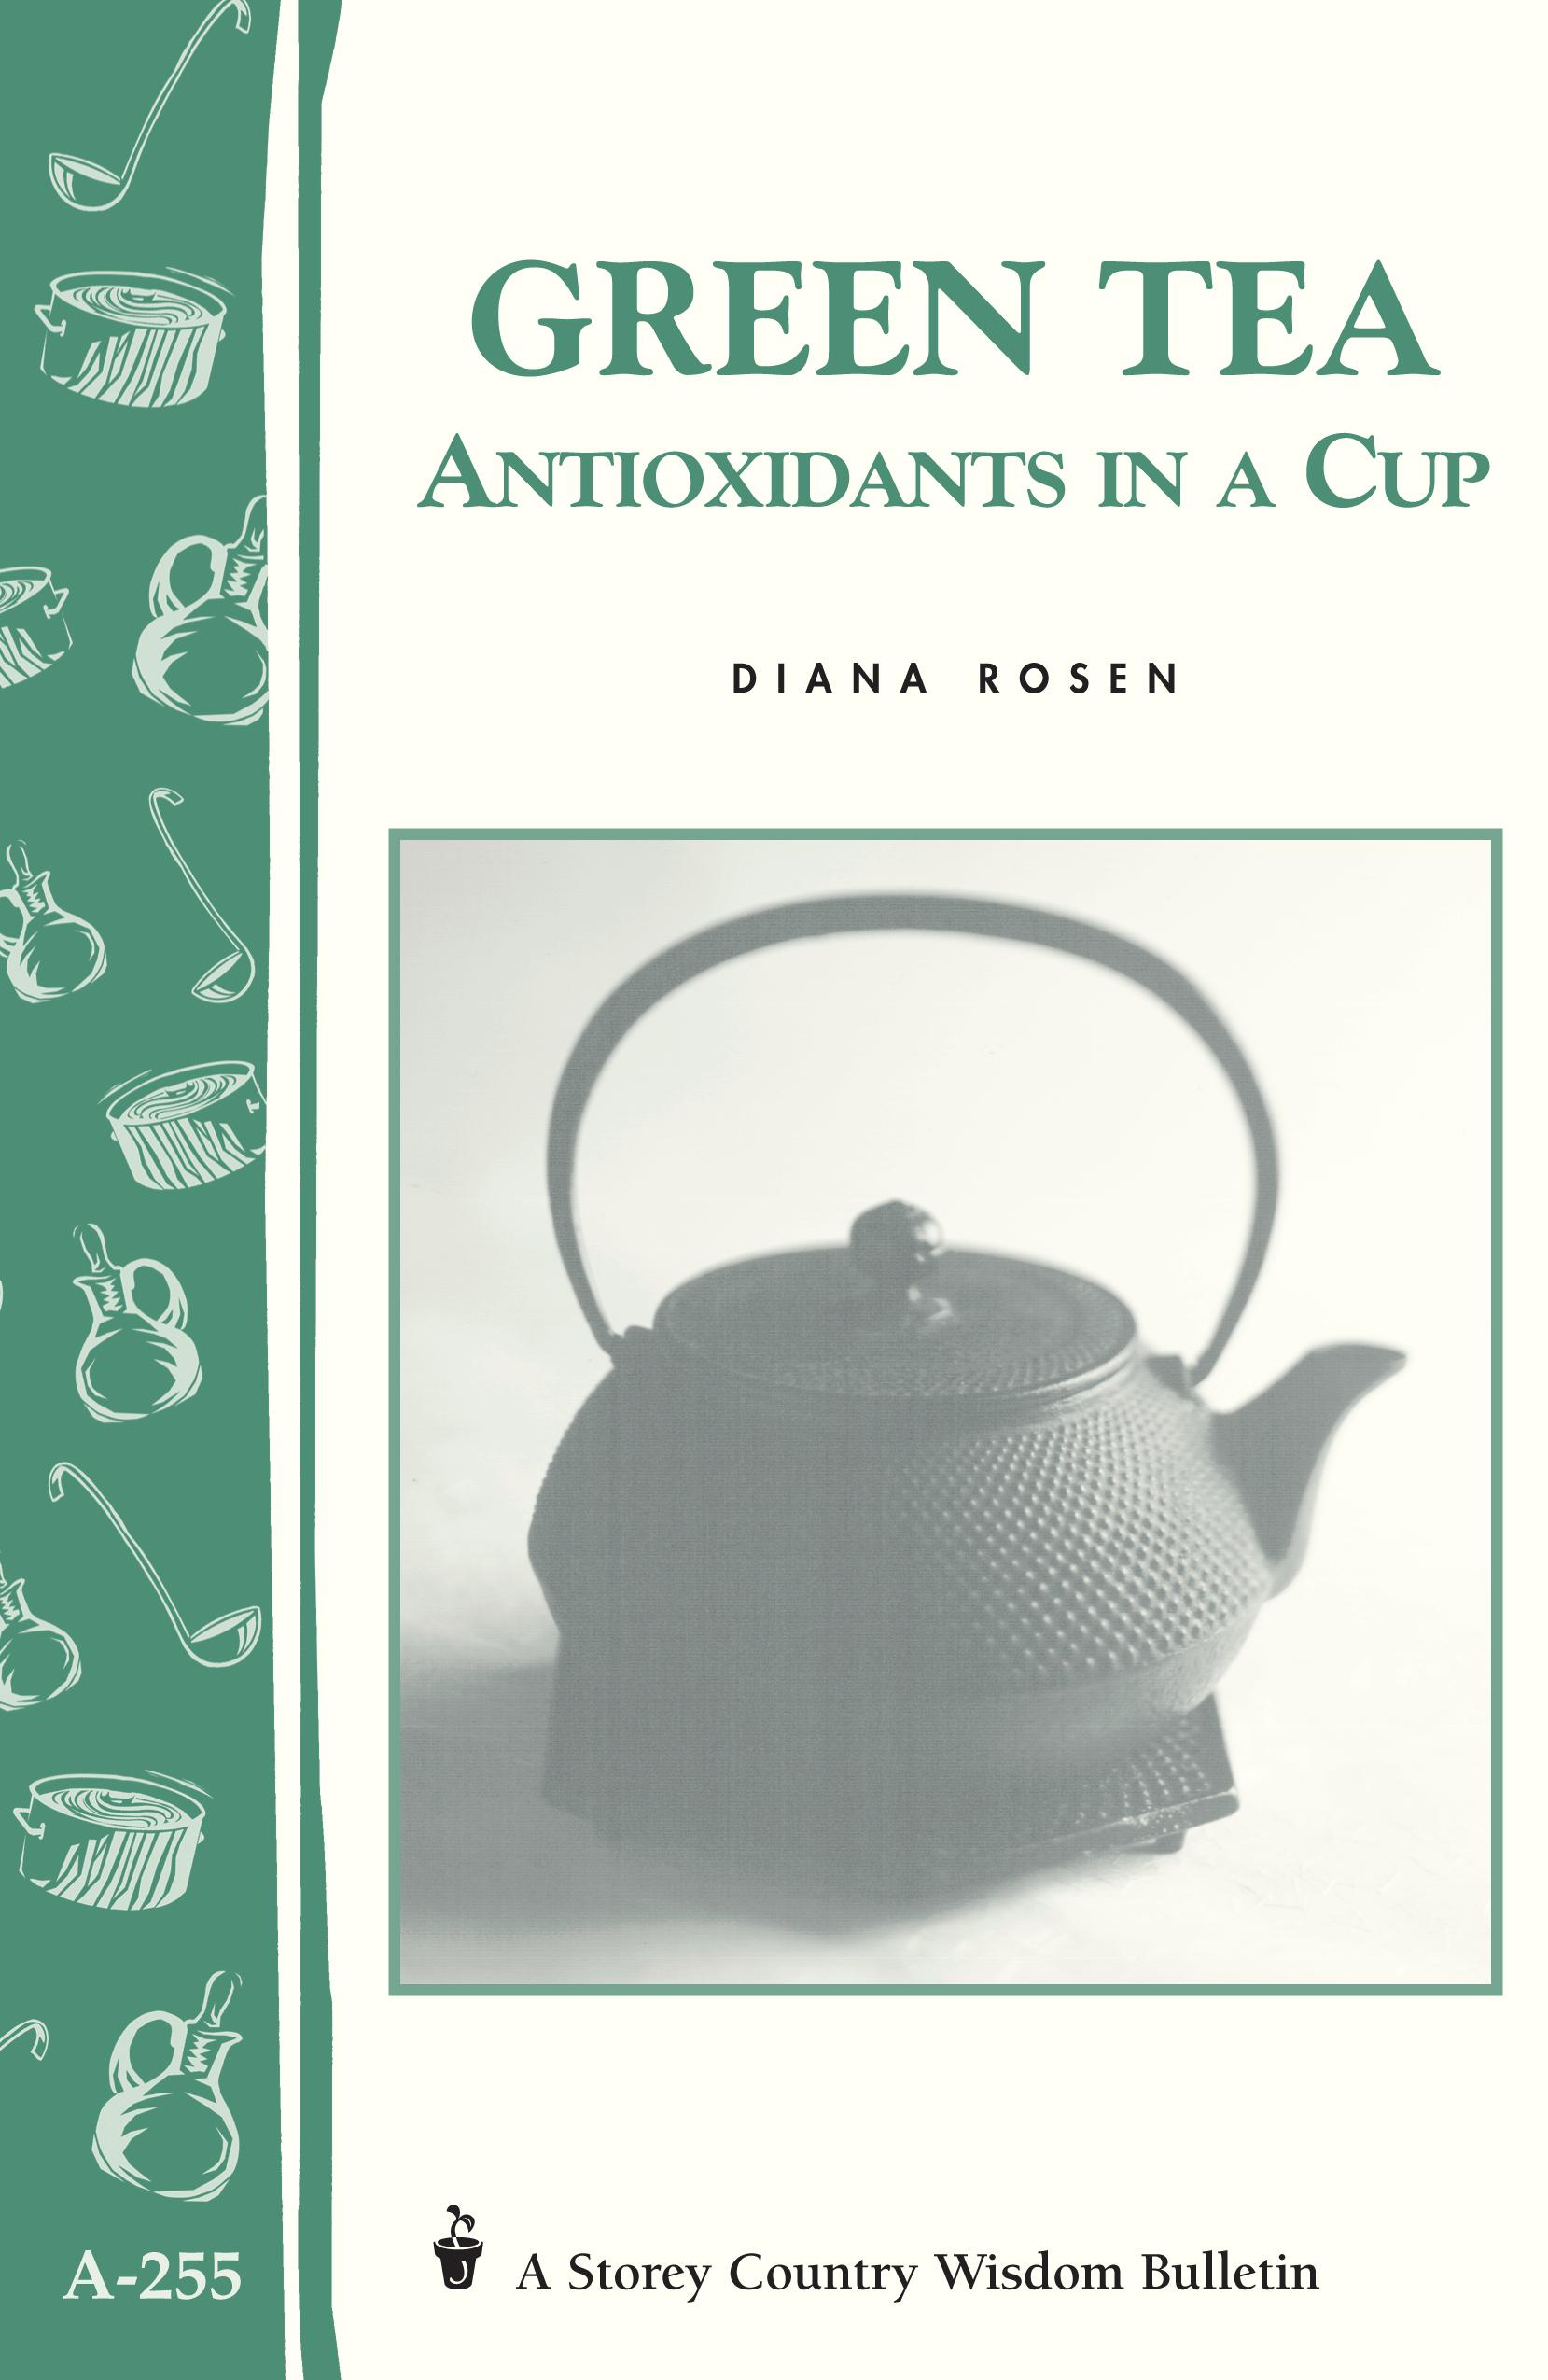 Green Tea: Antioxidants in a Cup Storey's Country Wisdom Bulletin A-255 - Diana Rosen